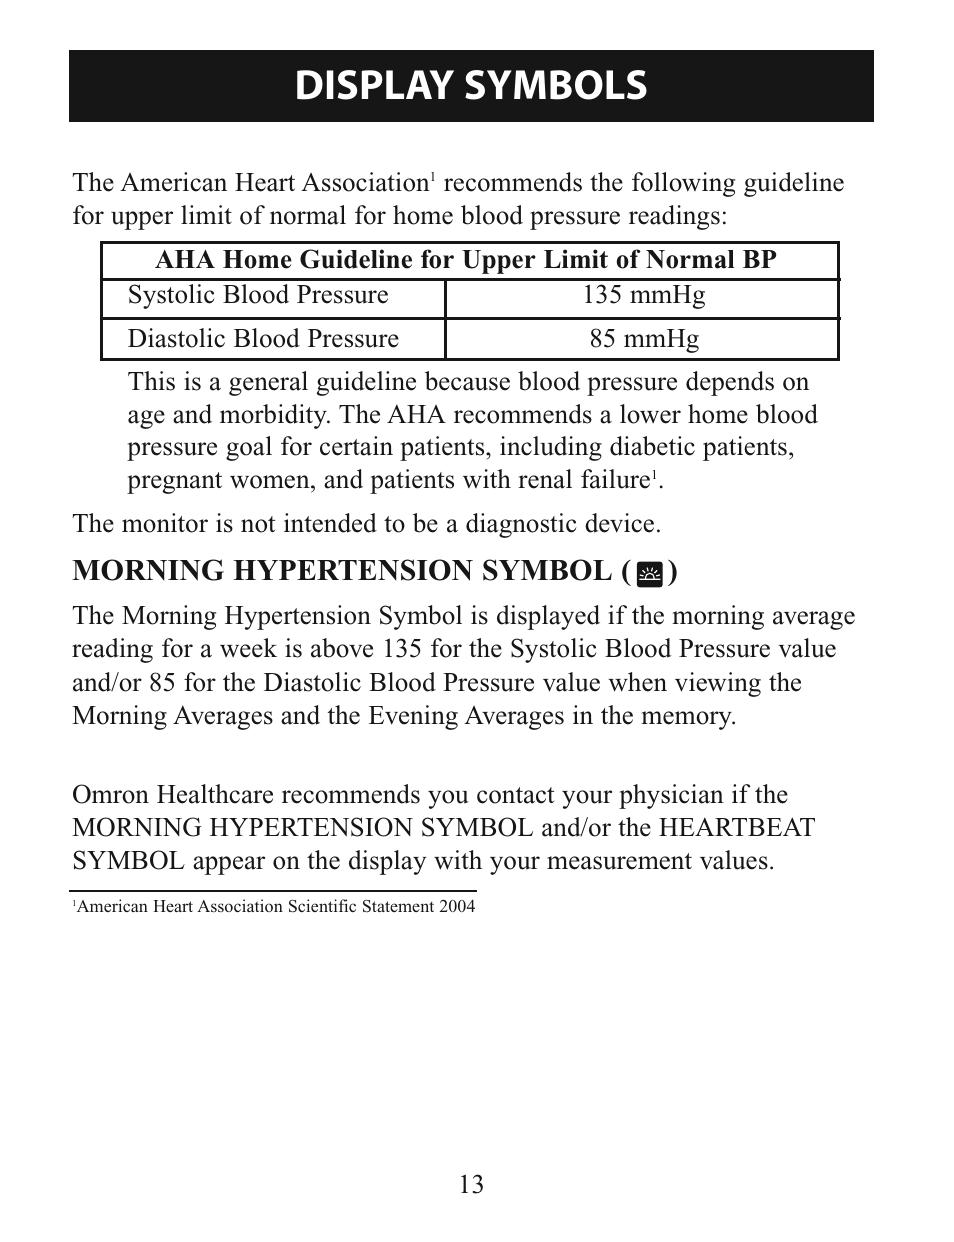 Display Symbols Morning Hypertension Symbol Omron Healthcare